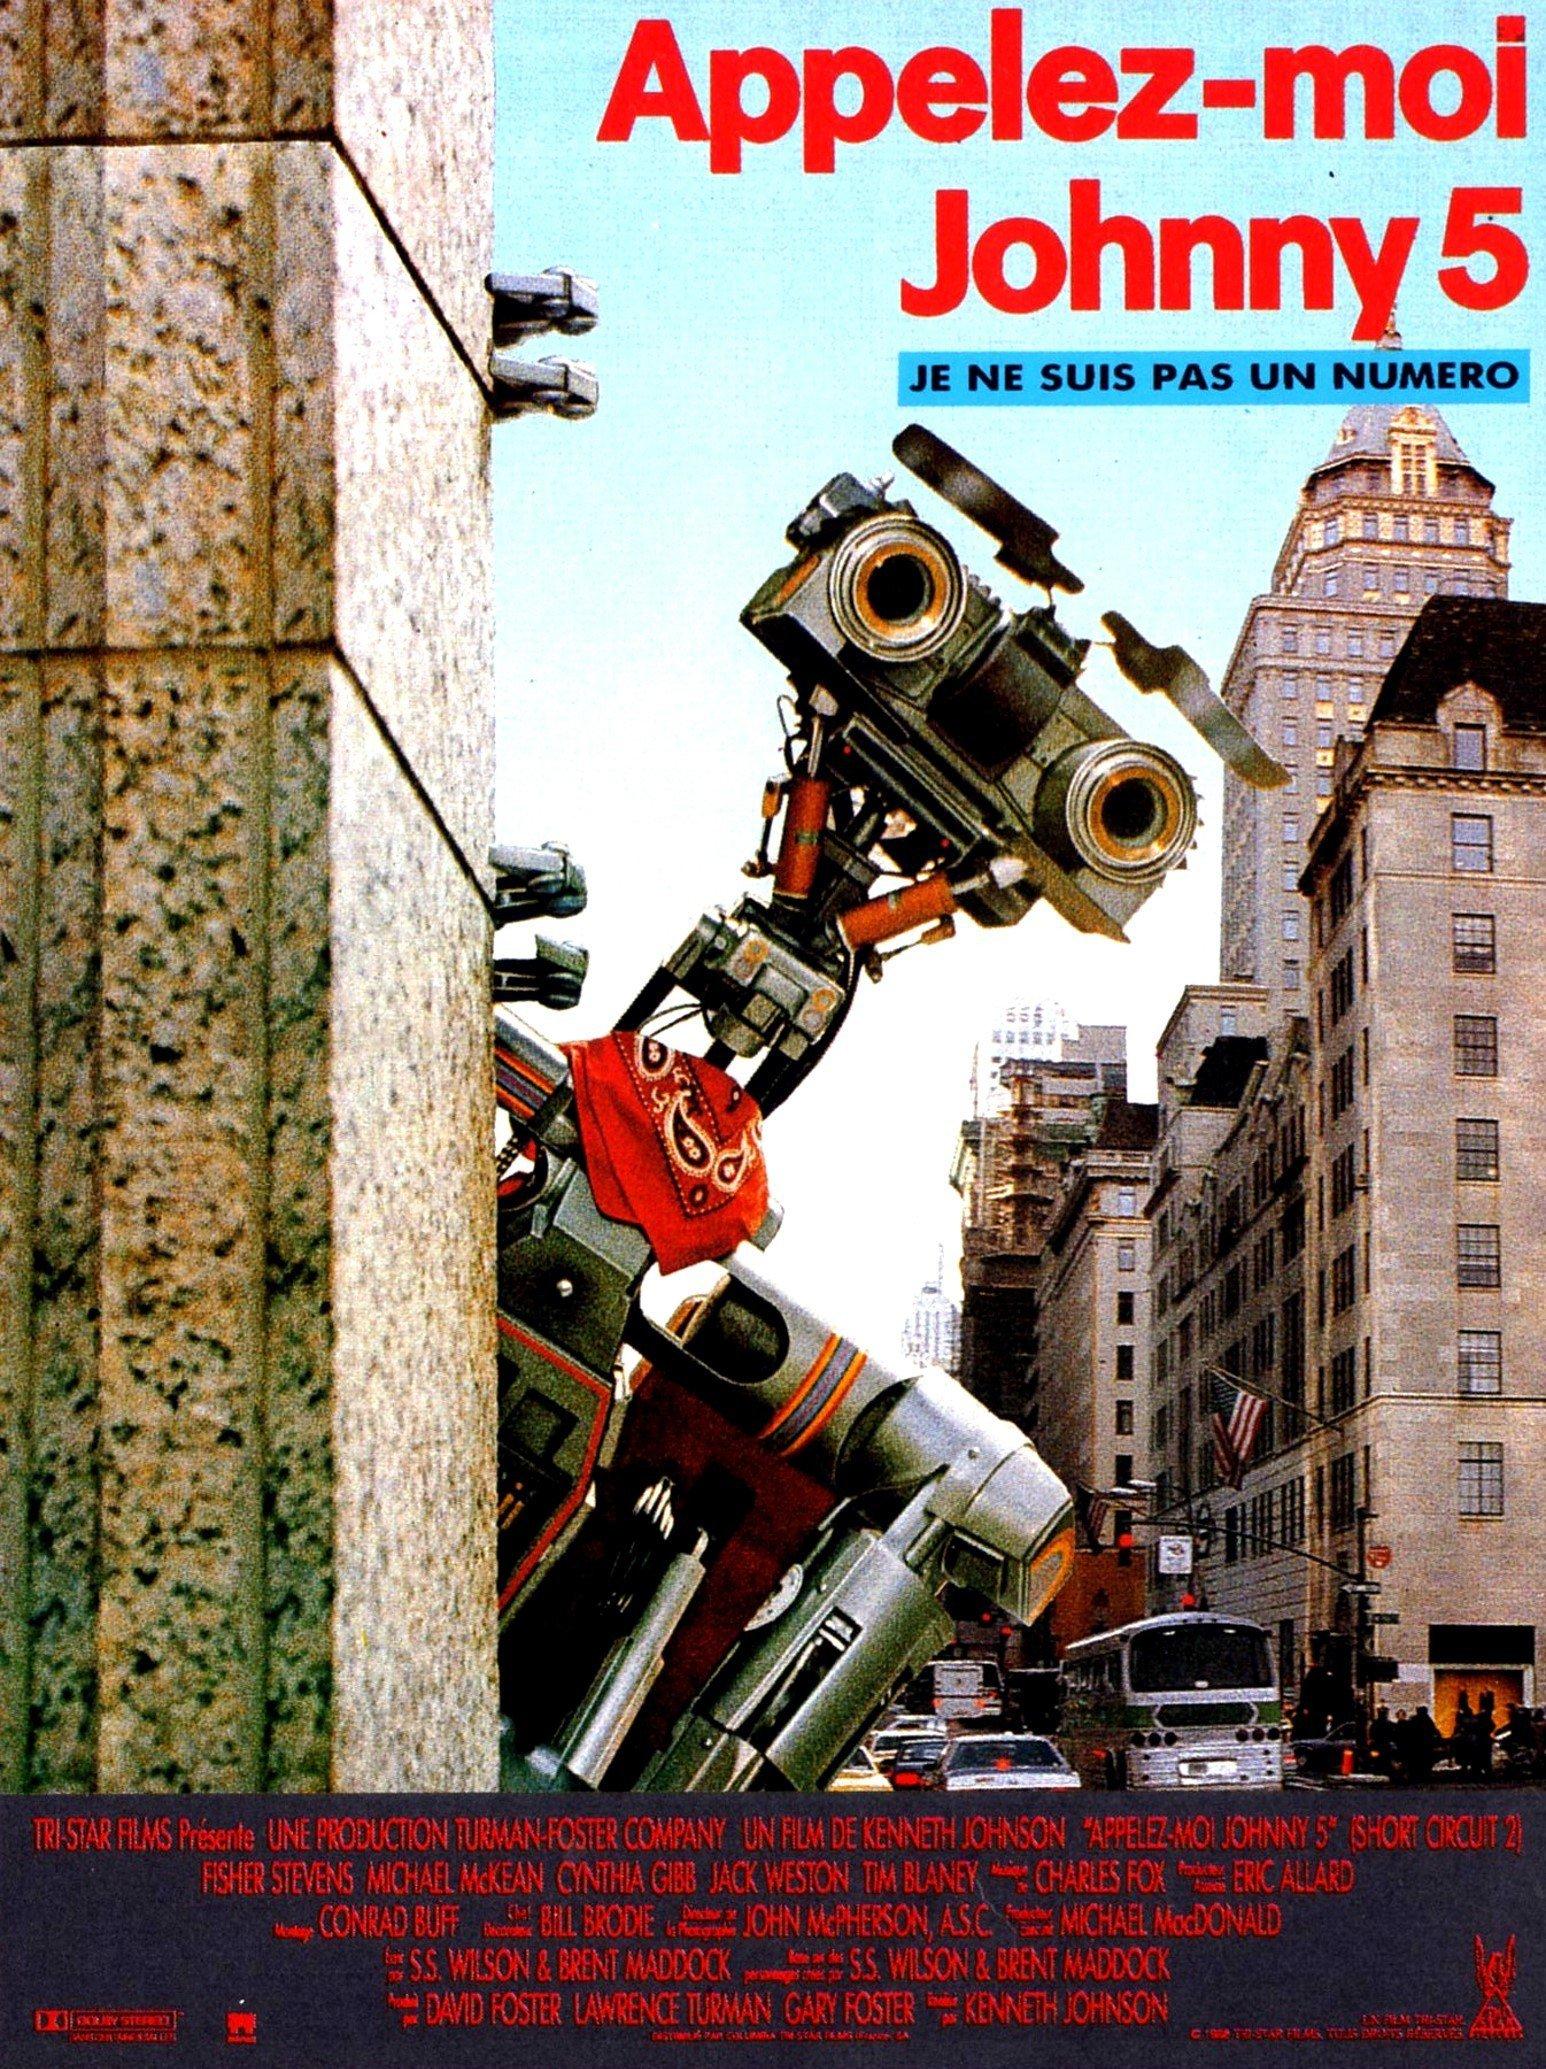 affiche du film Appelez-moi Johnny 5